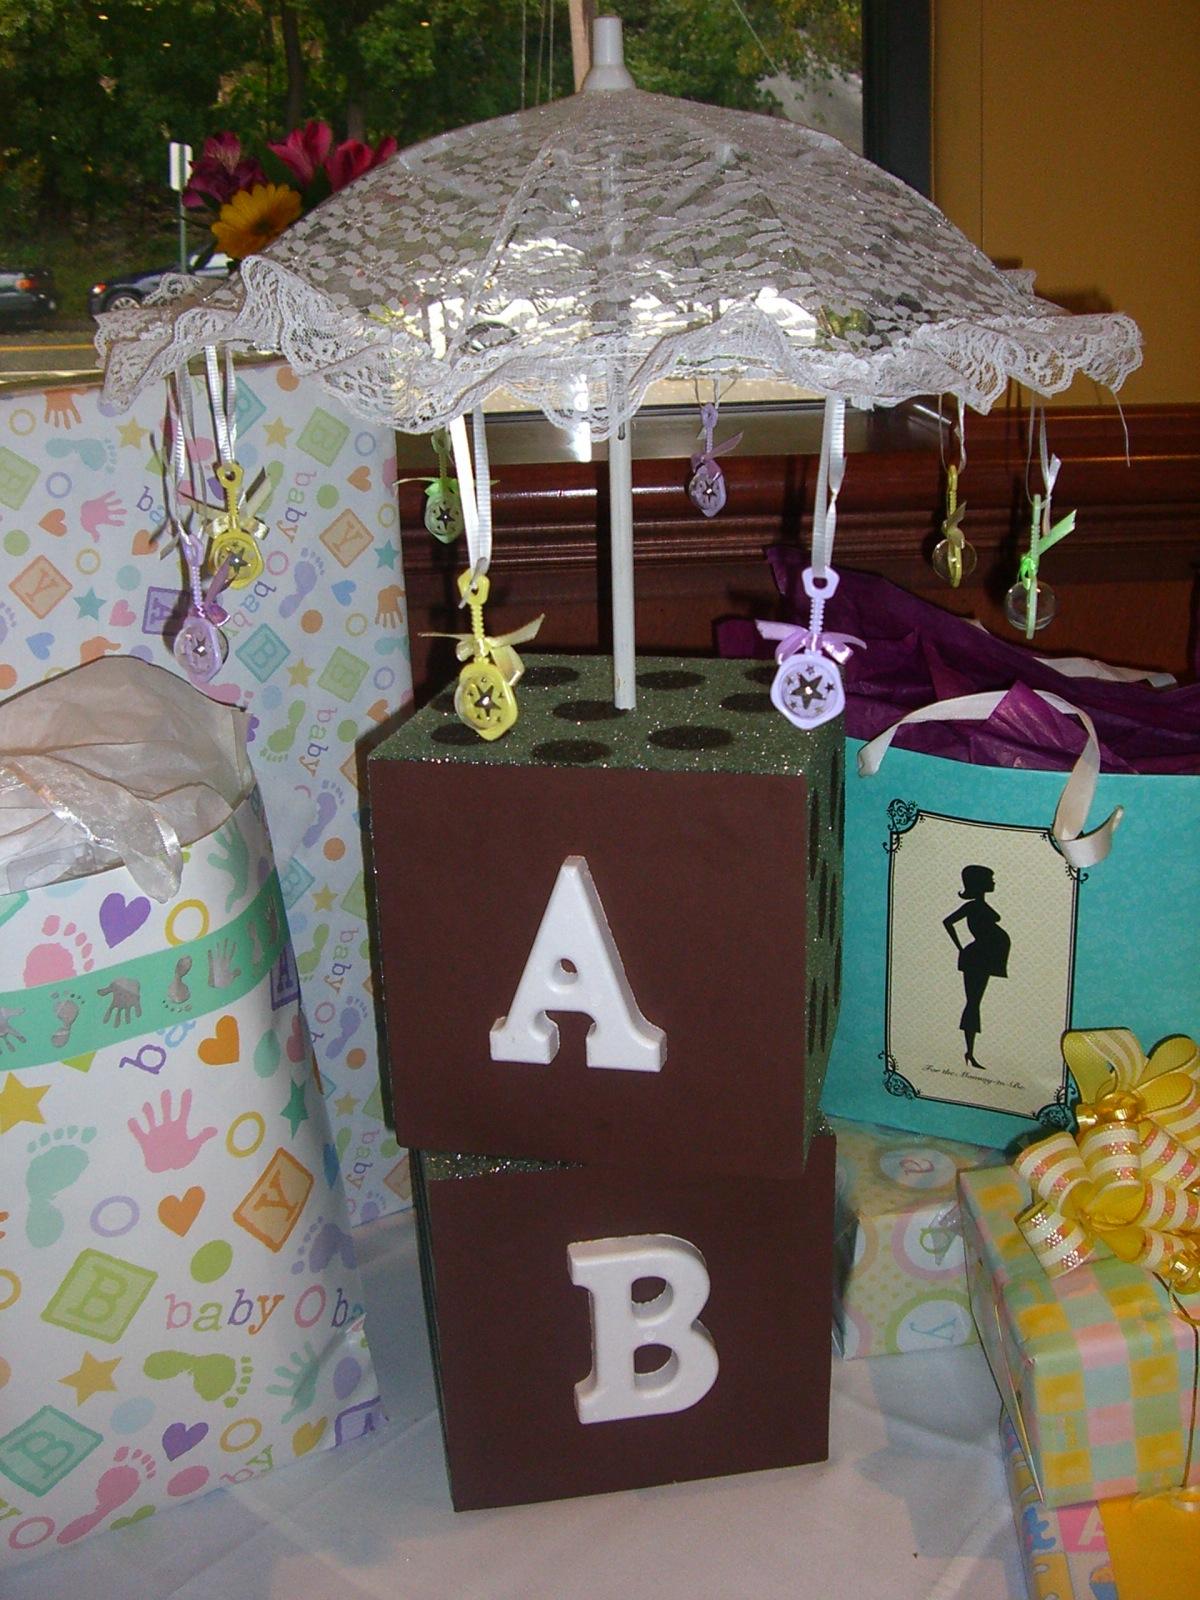 How to Make Baby Shower Umbrellas How to Make Baby Shower Umbrellas new picture